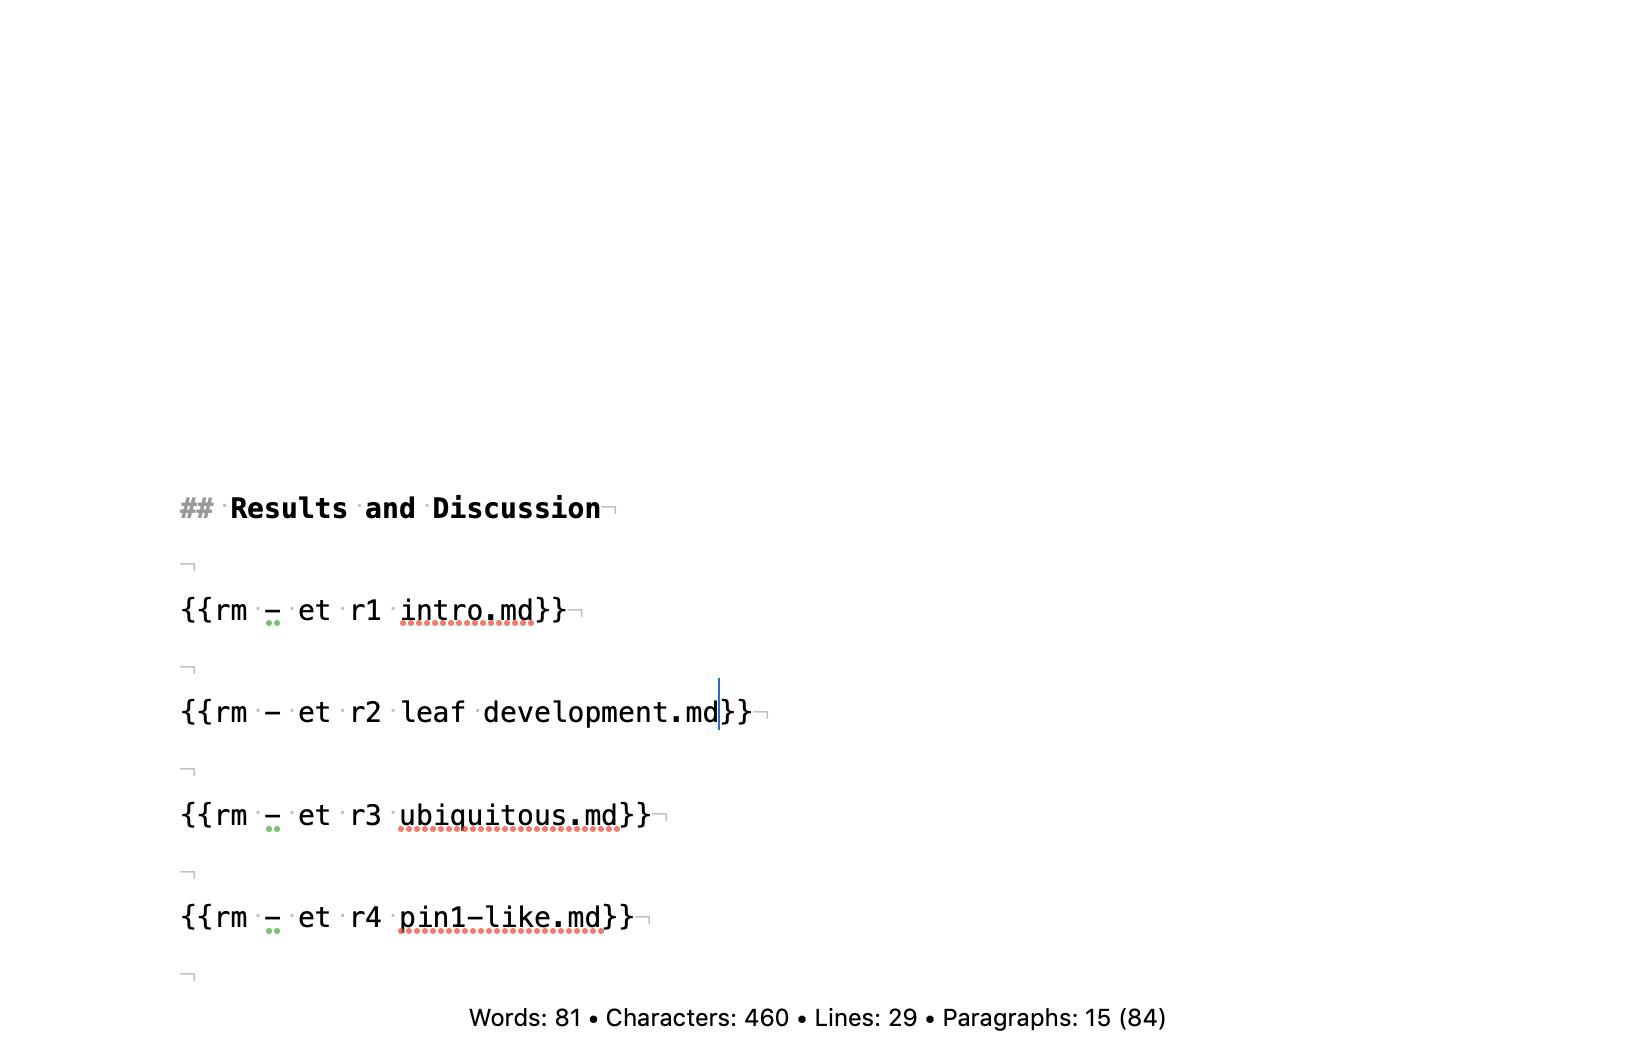 Transclusion_file